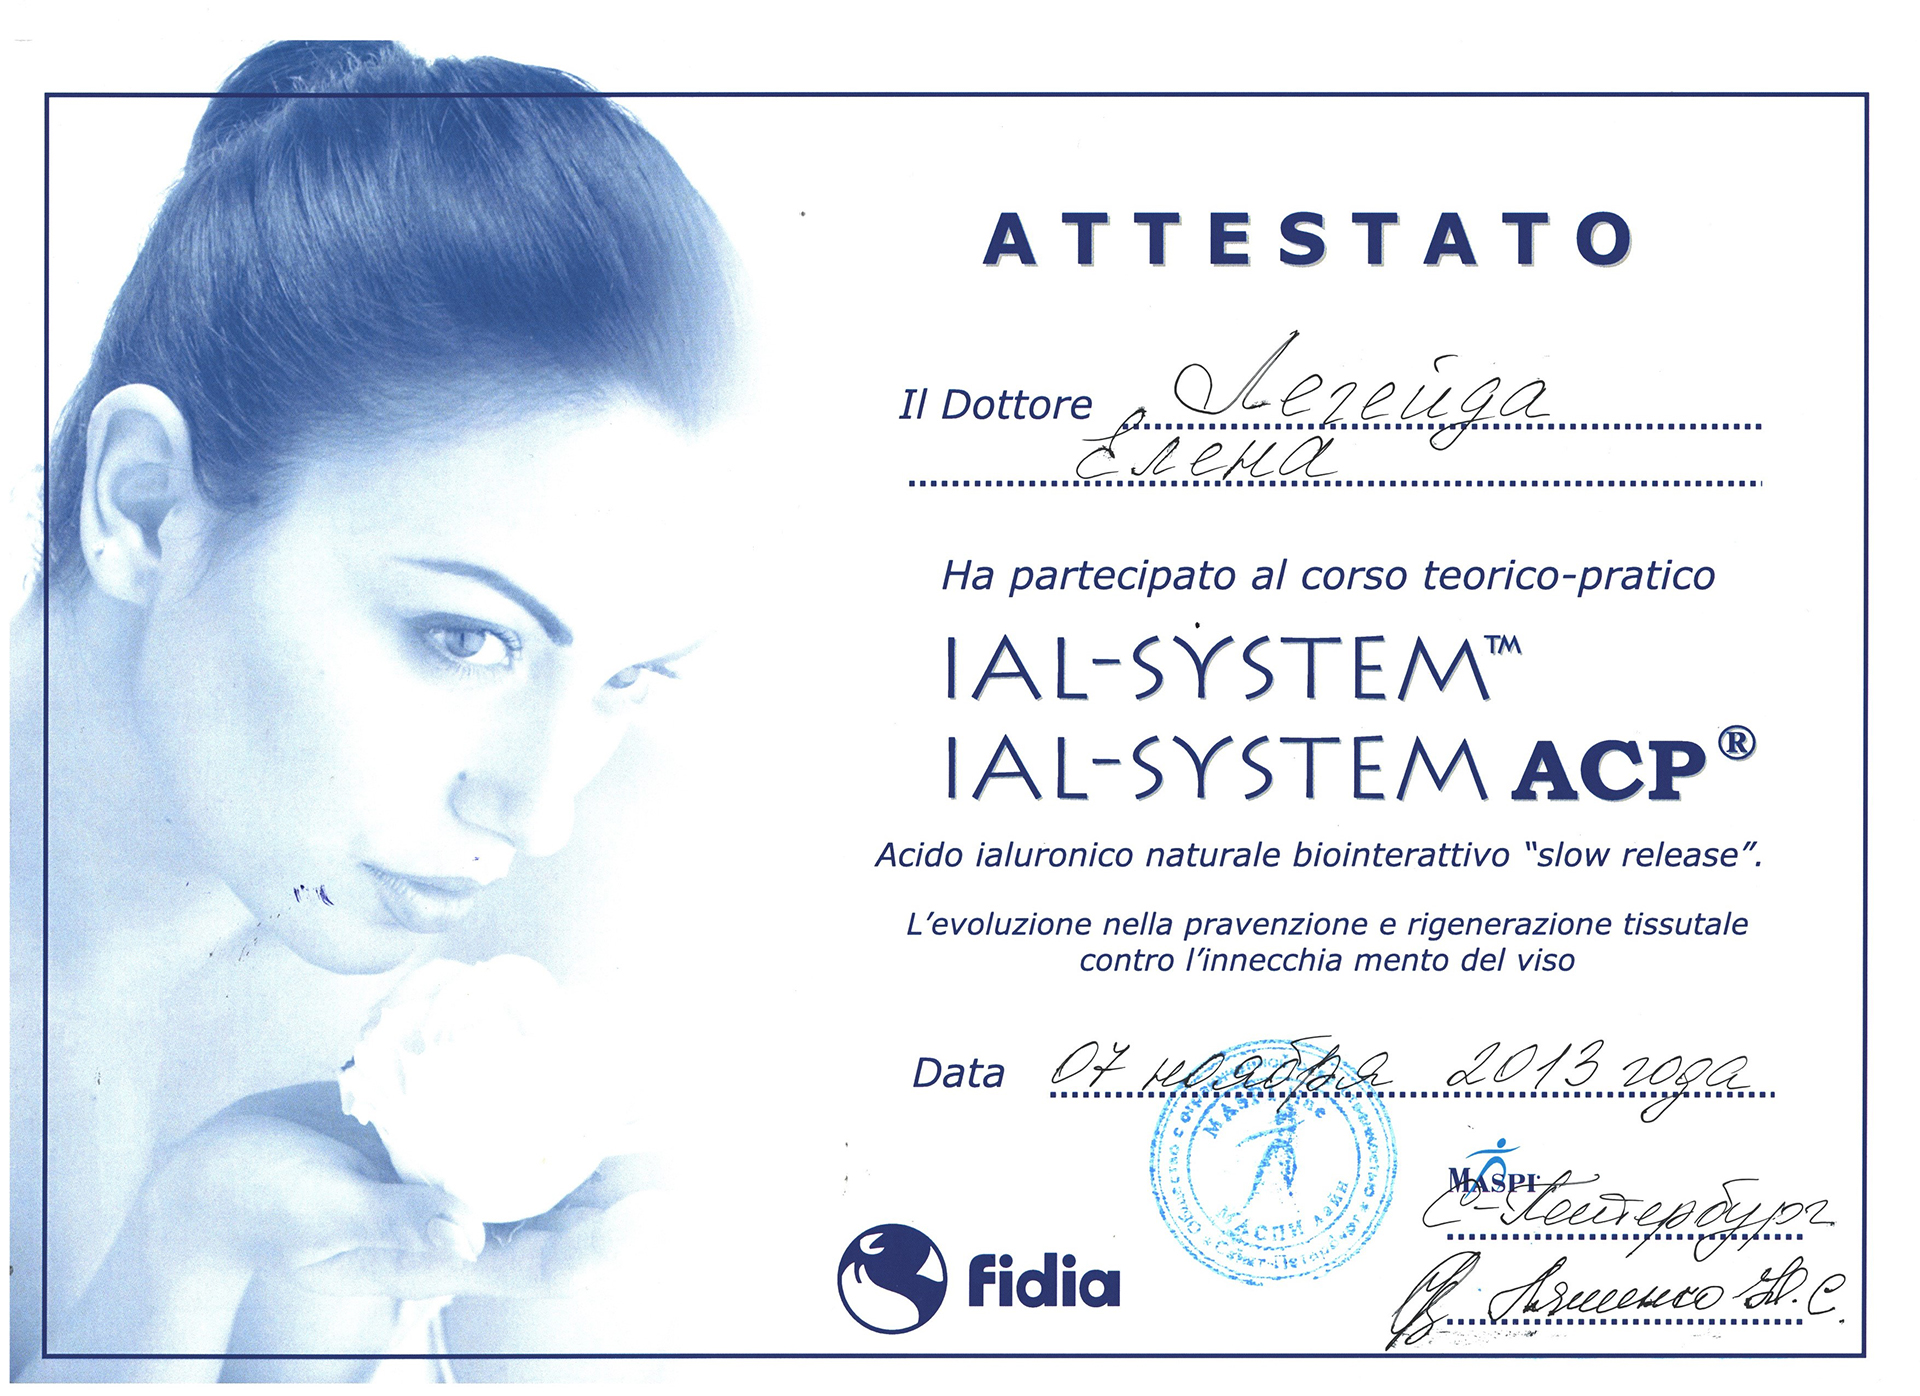 Сертификат — Ial-System. Легейда Елена Валерьевна